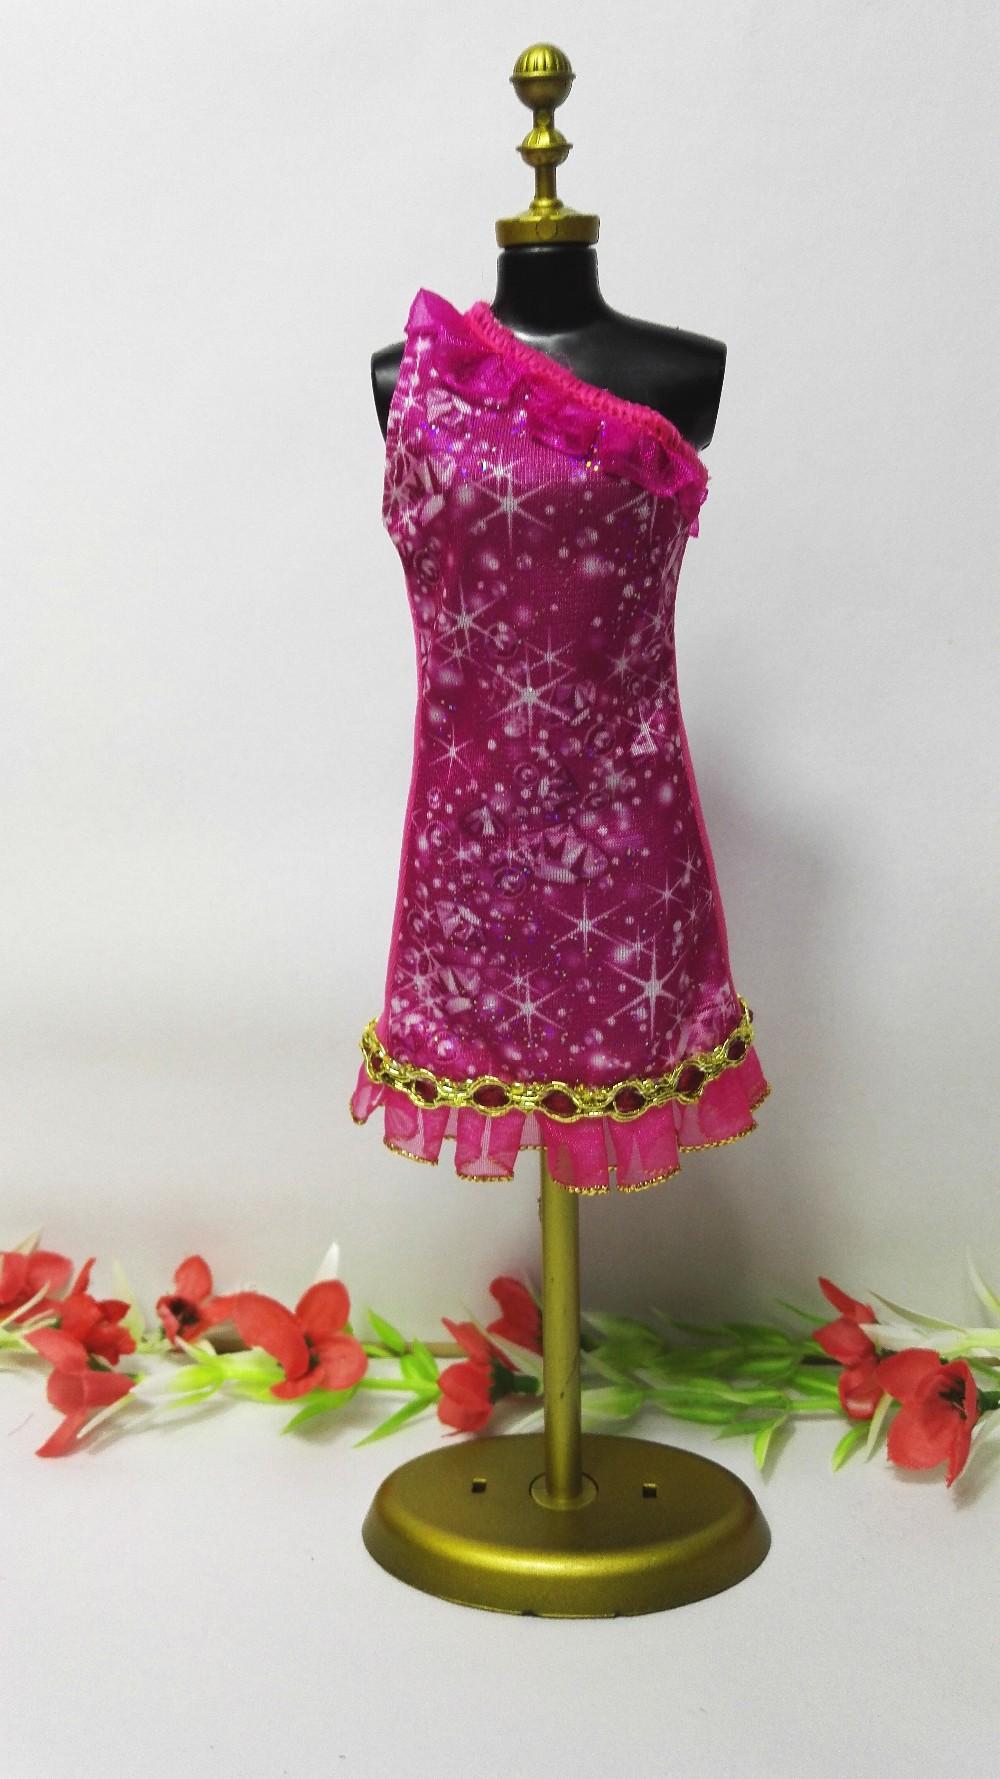 new equipment 5sets=garments pants or mini skirt set vogue outfit Garments outwear swimsuit set coat for barbie doll